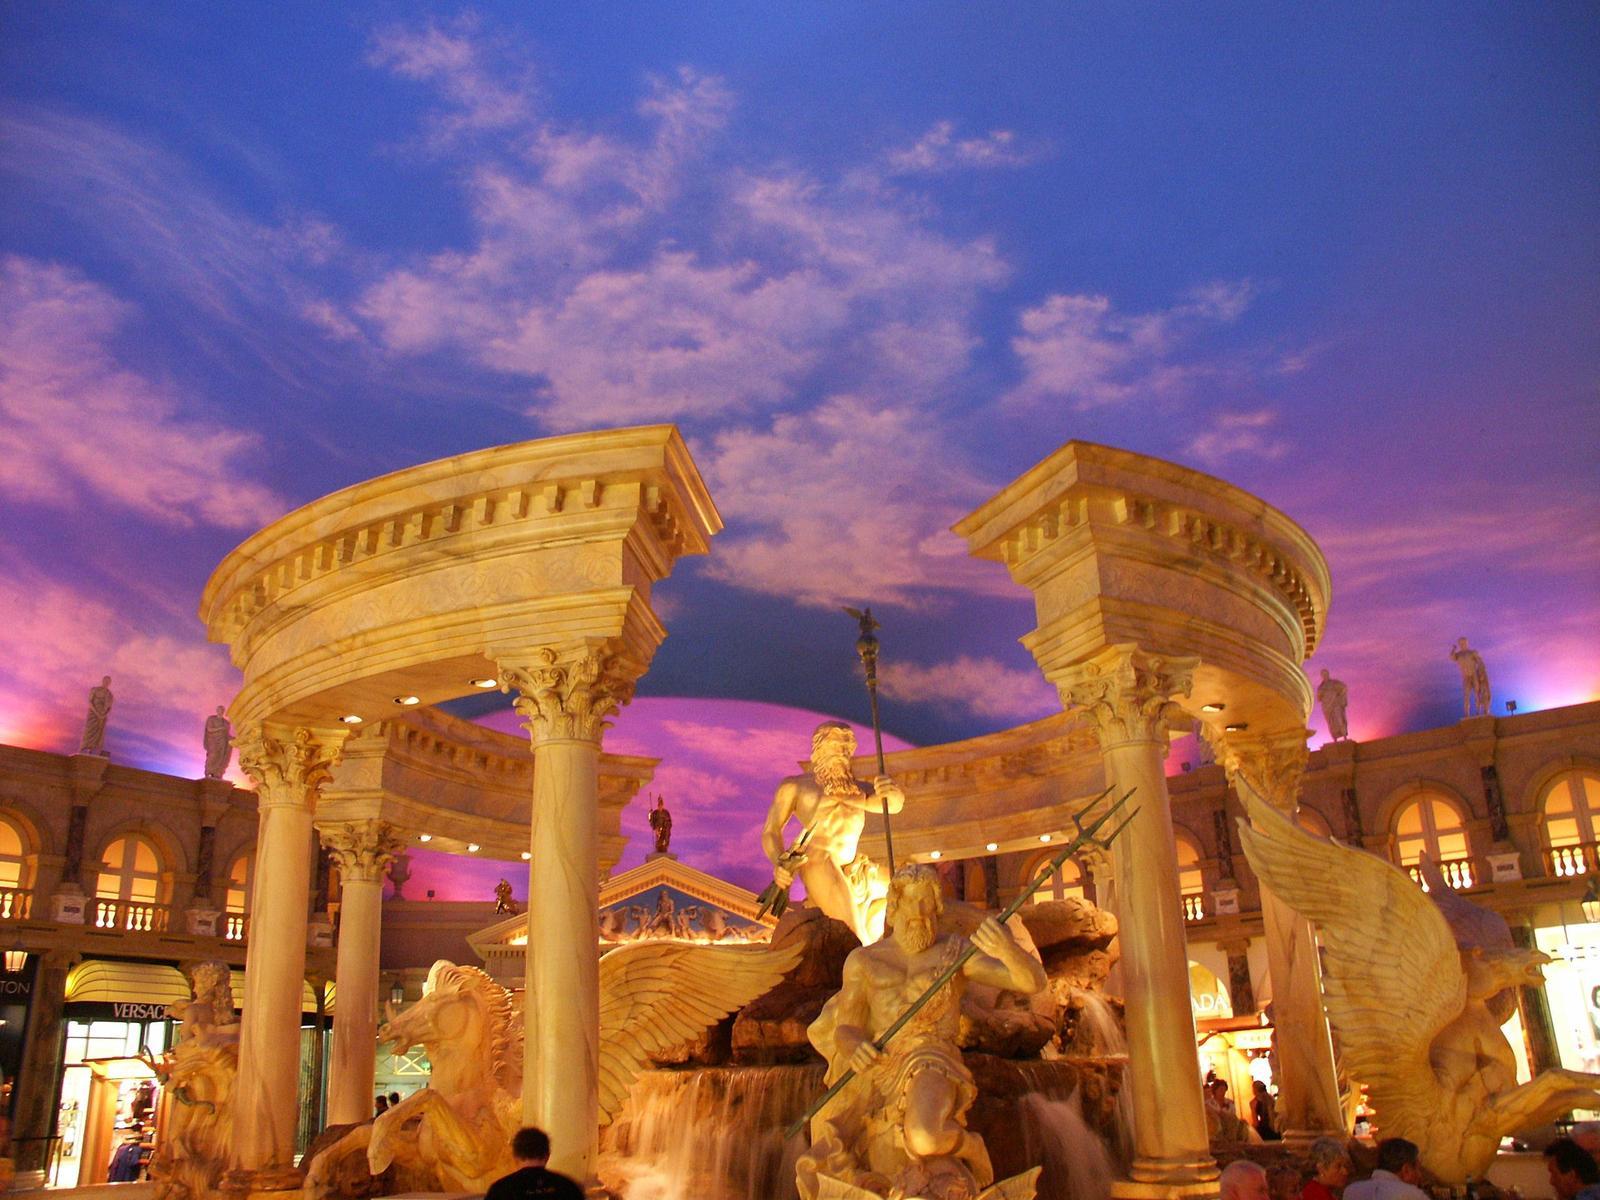 Free Caesars Palace Statue Stock Photo - FreeImages.com